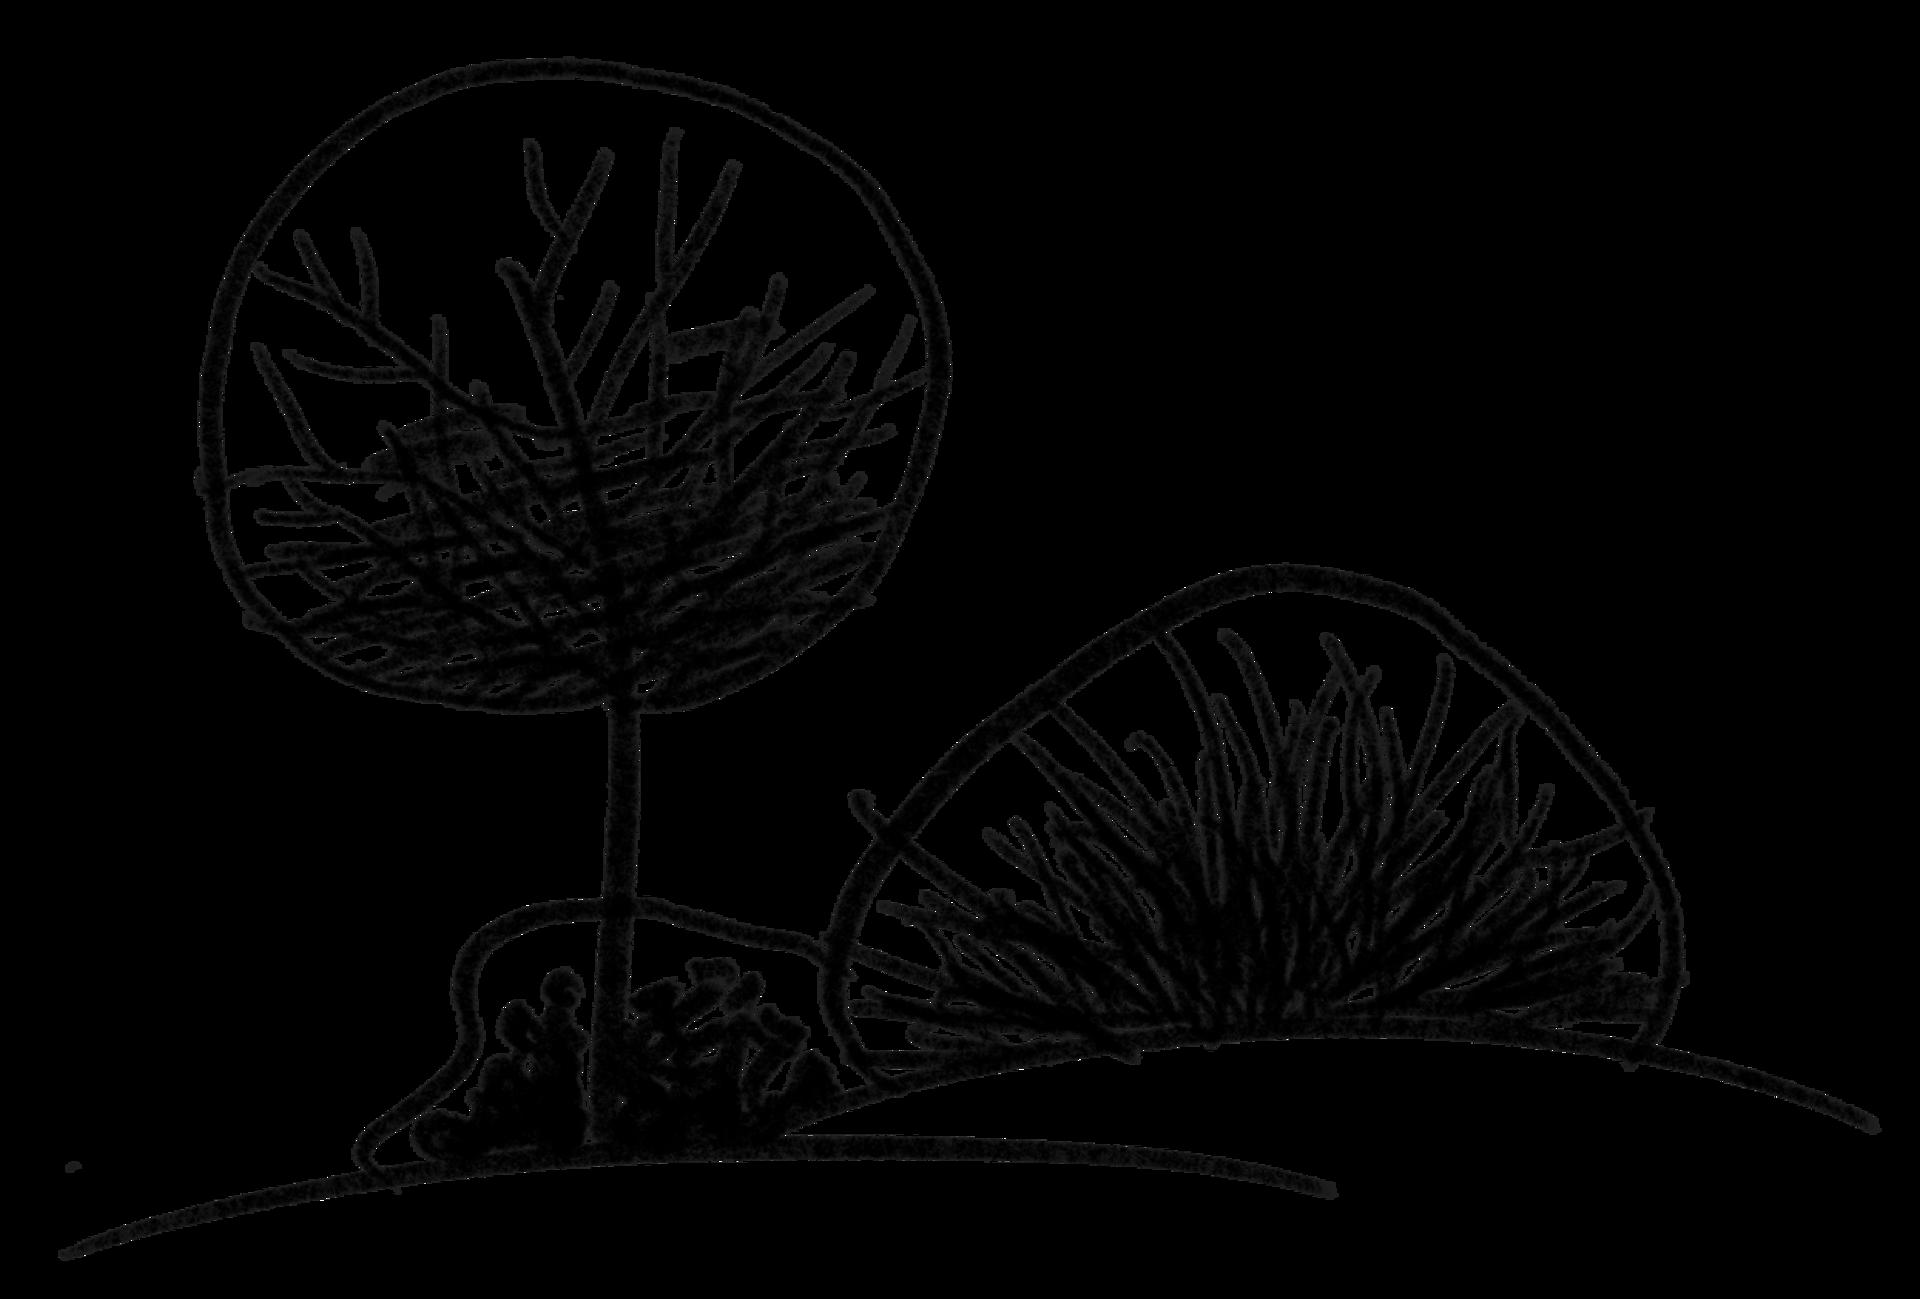 microadventure_illu_tree-3_illustration-clipping